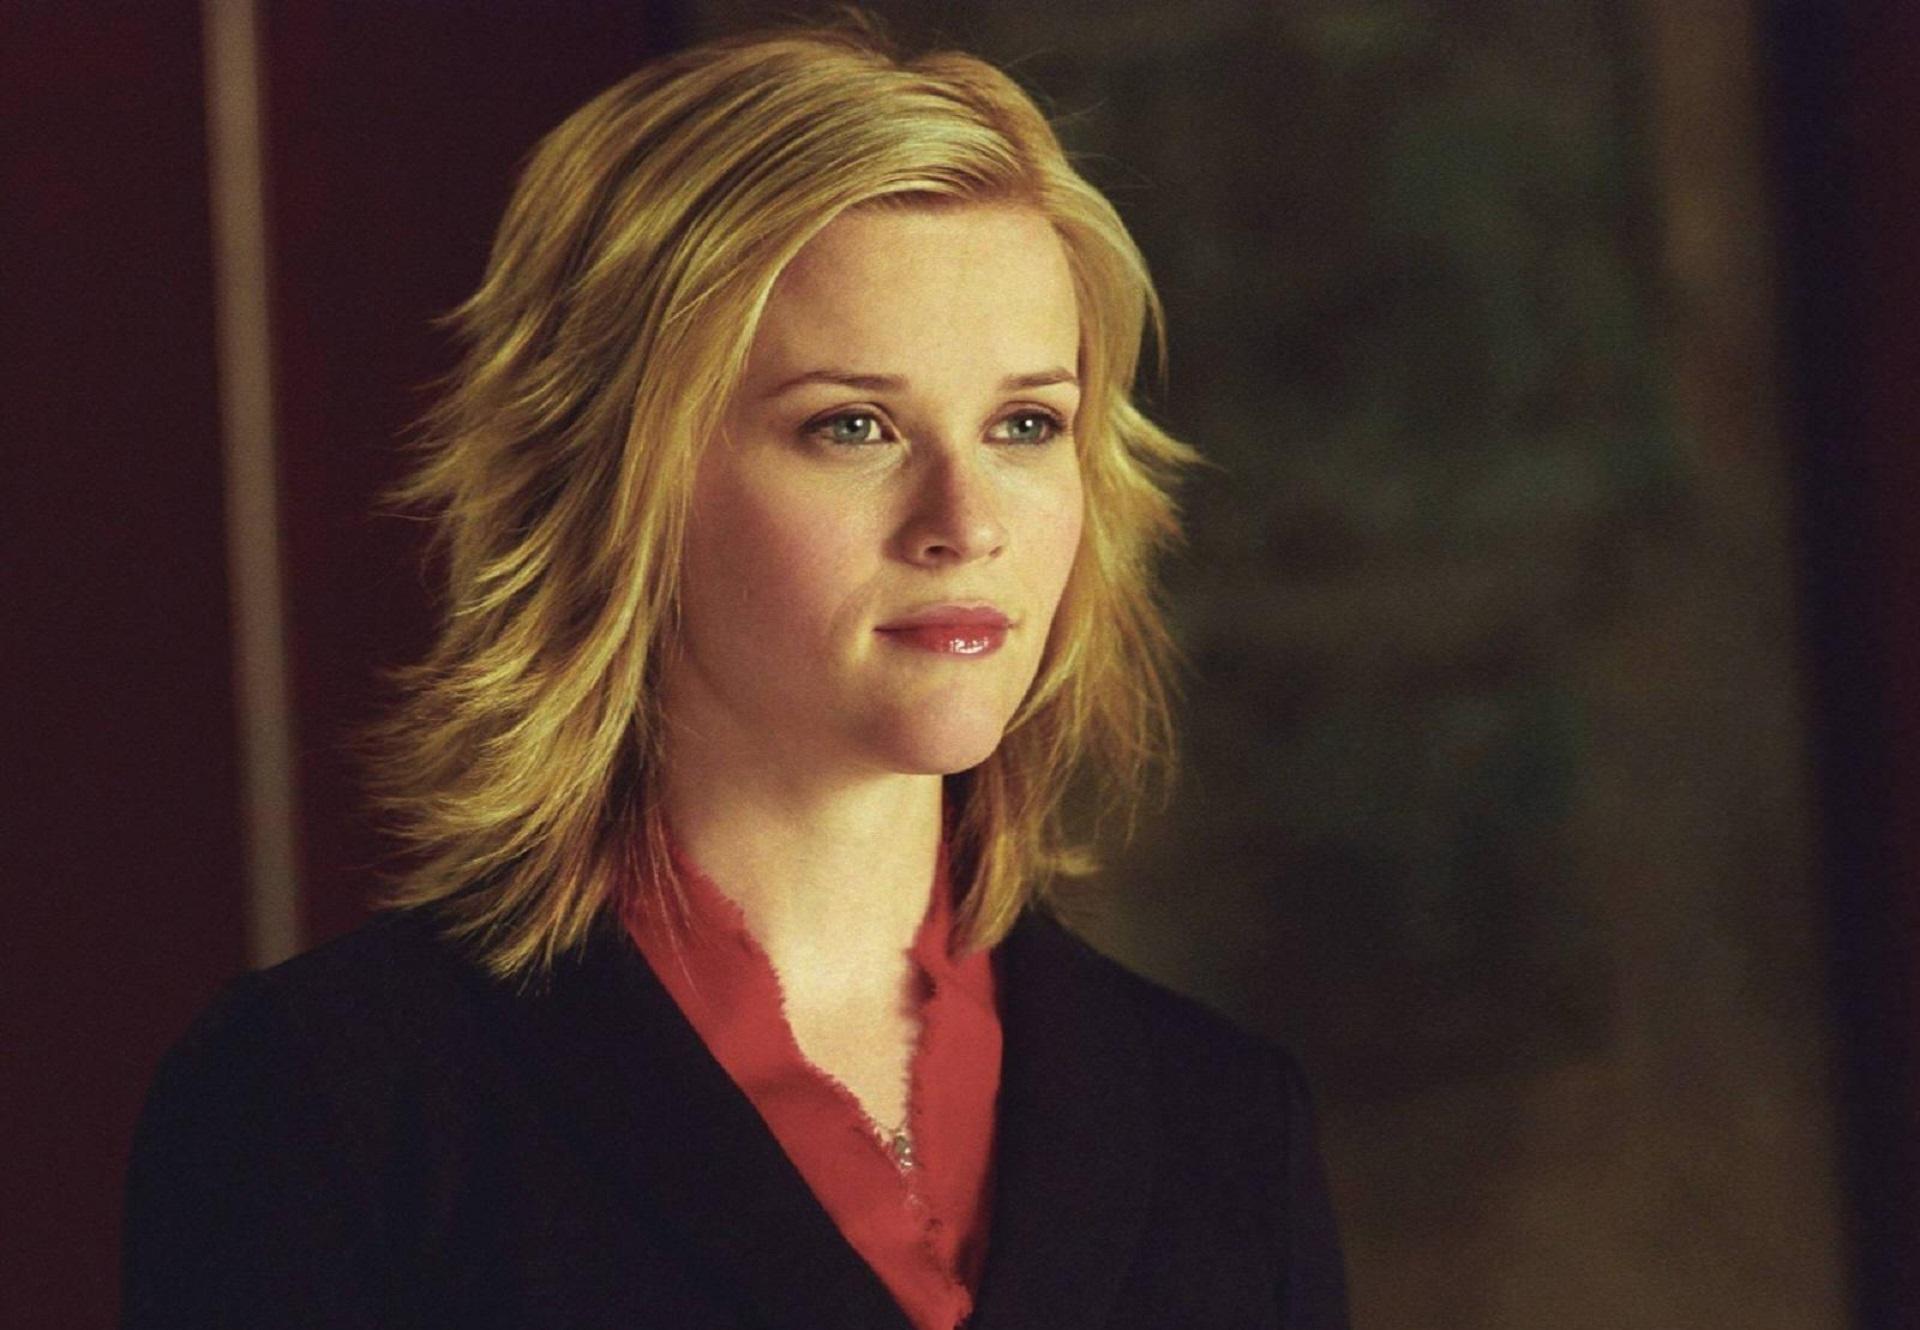 Reese Witherspoon Hd Desktop